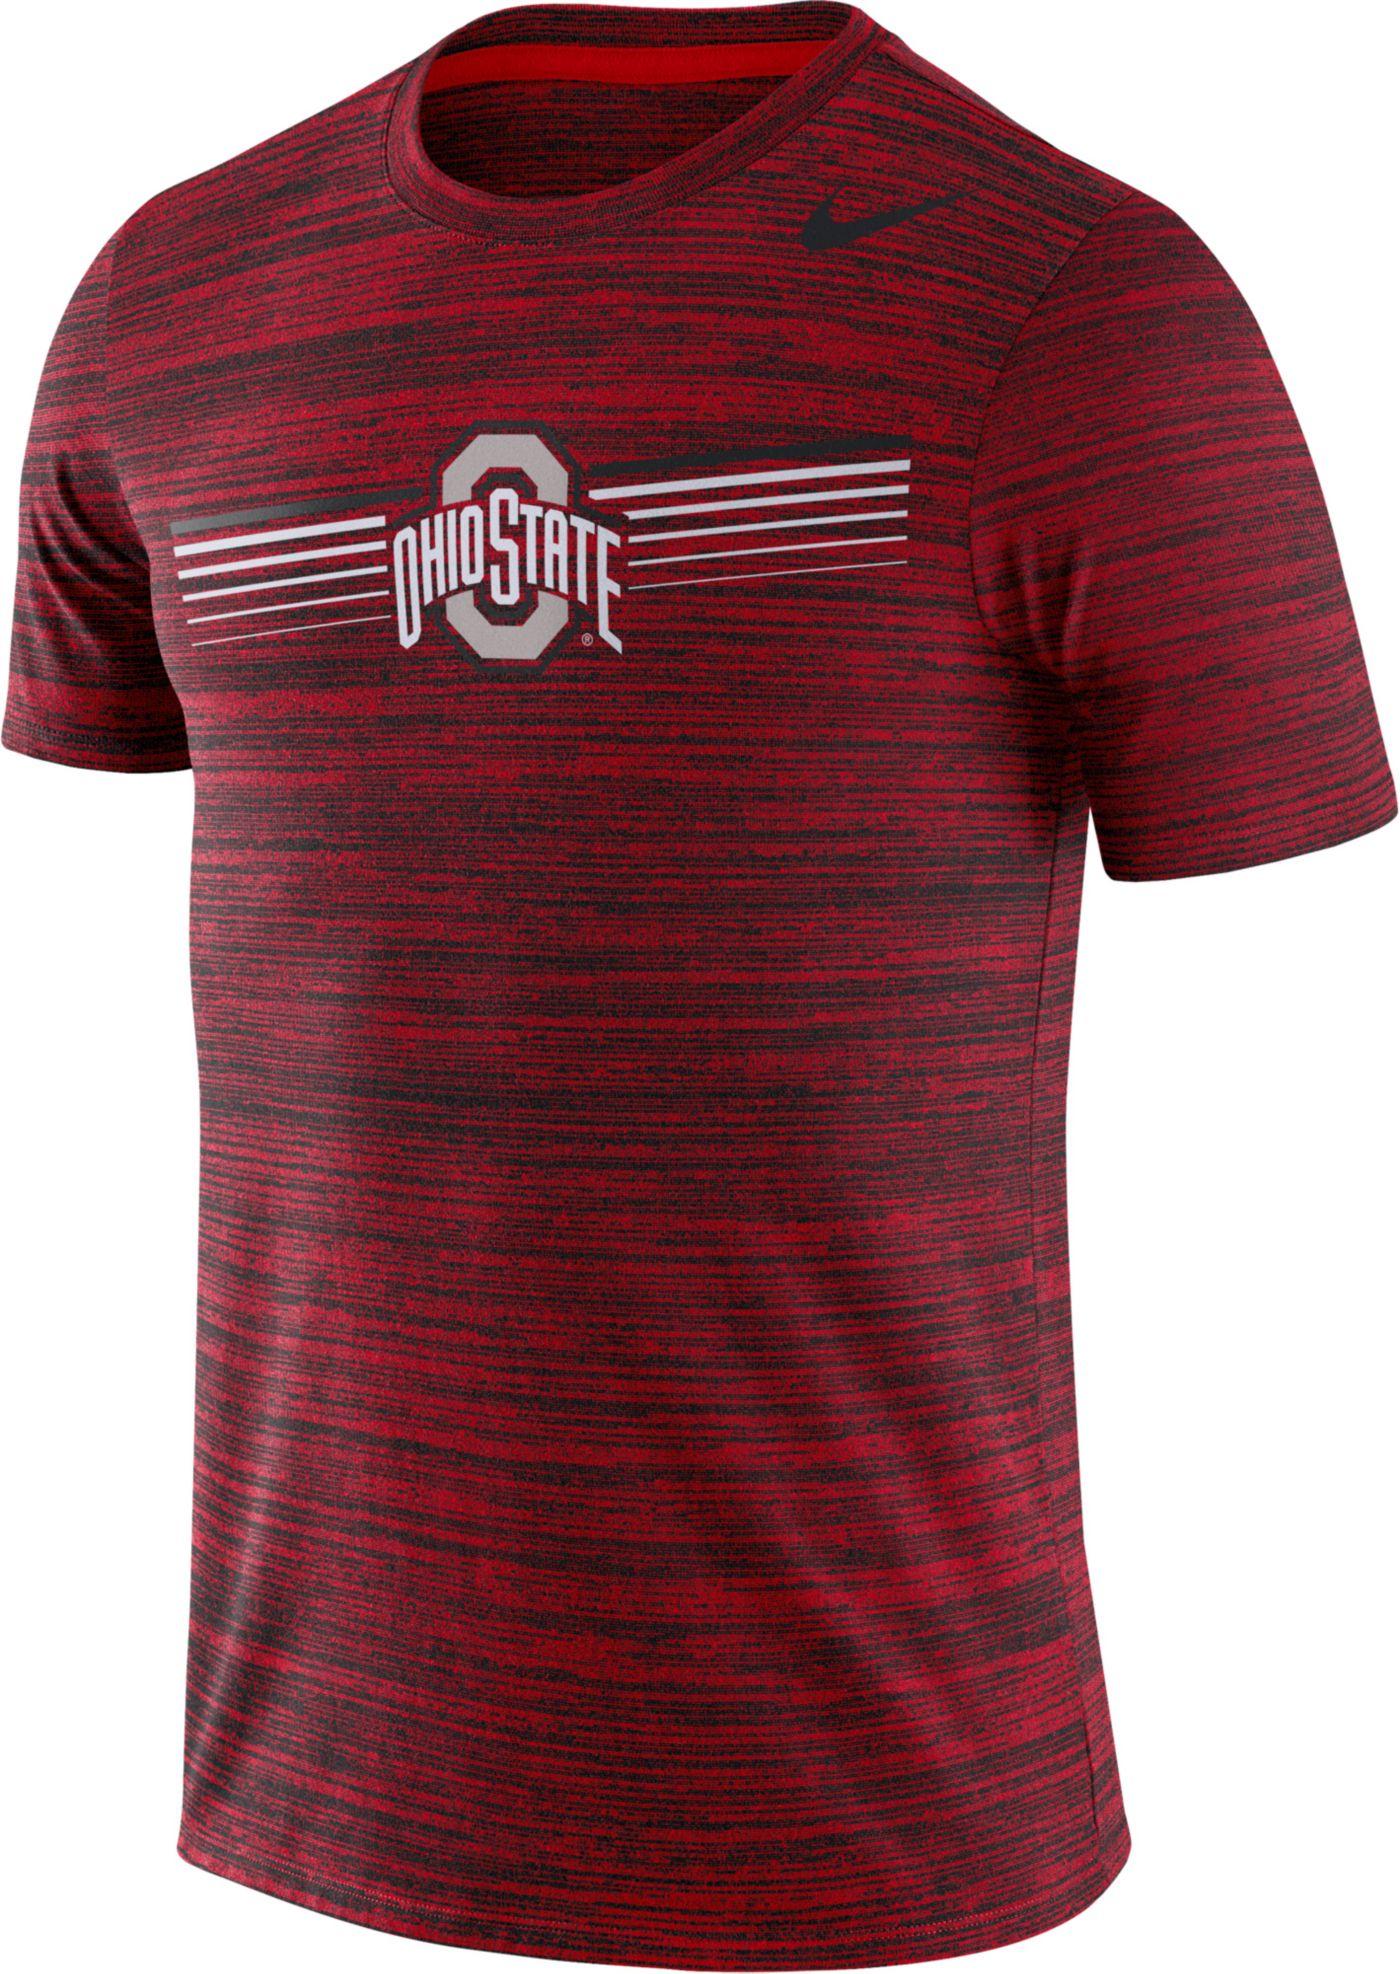 Nike Men's Ohio State Buckeyes Scarlet Velocity Legend Graphic T-Shirt